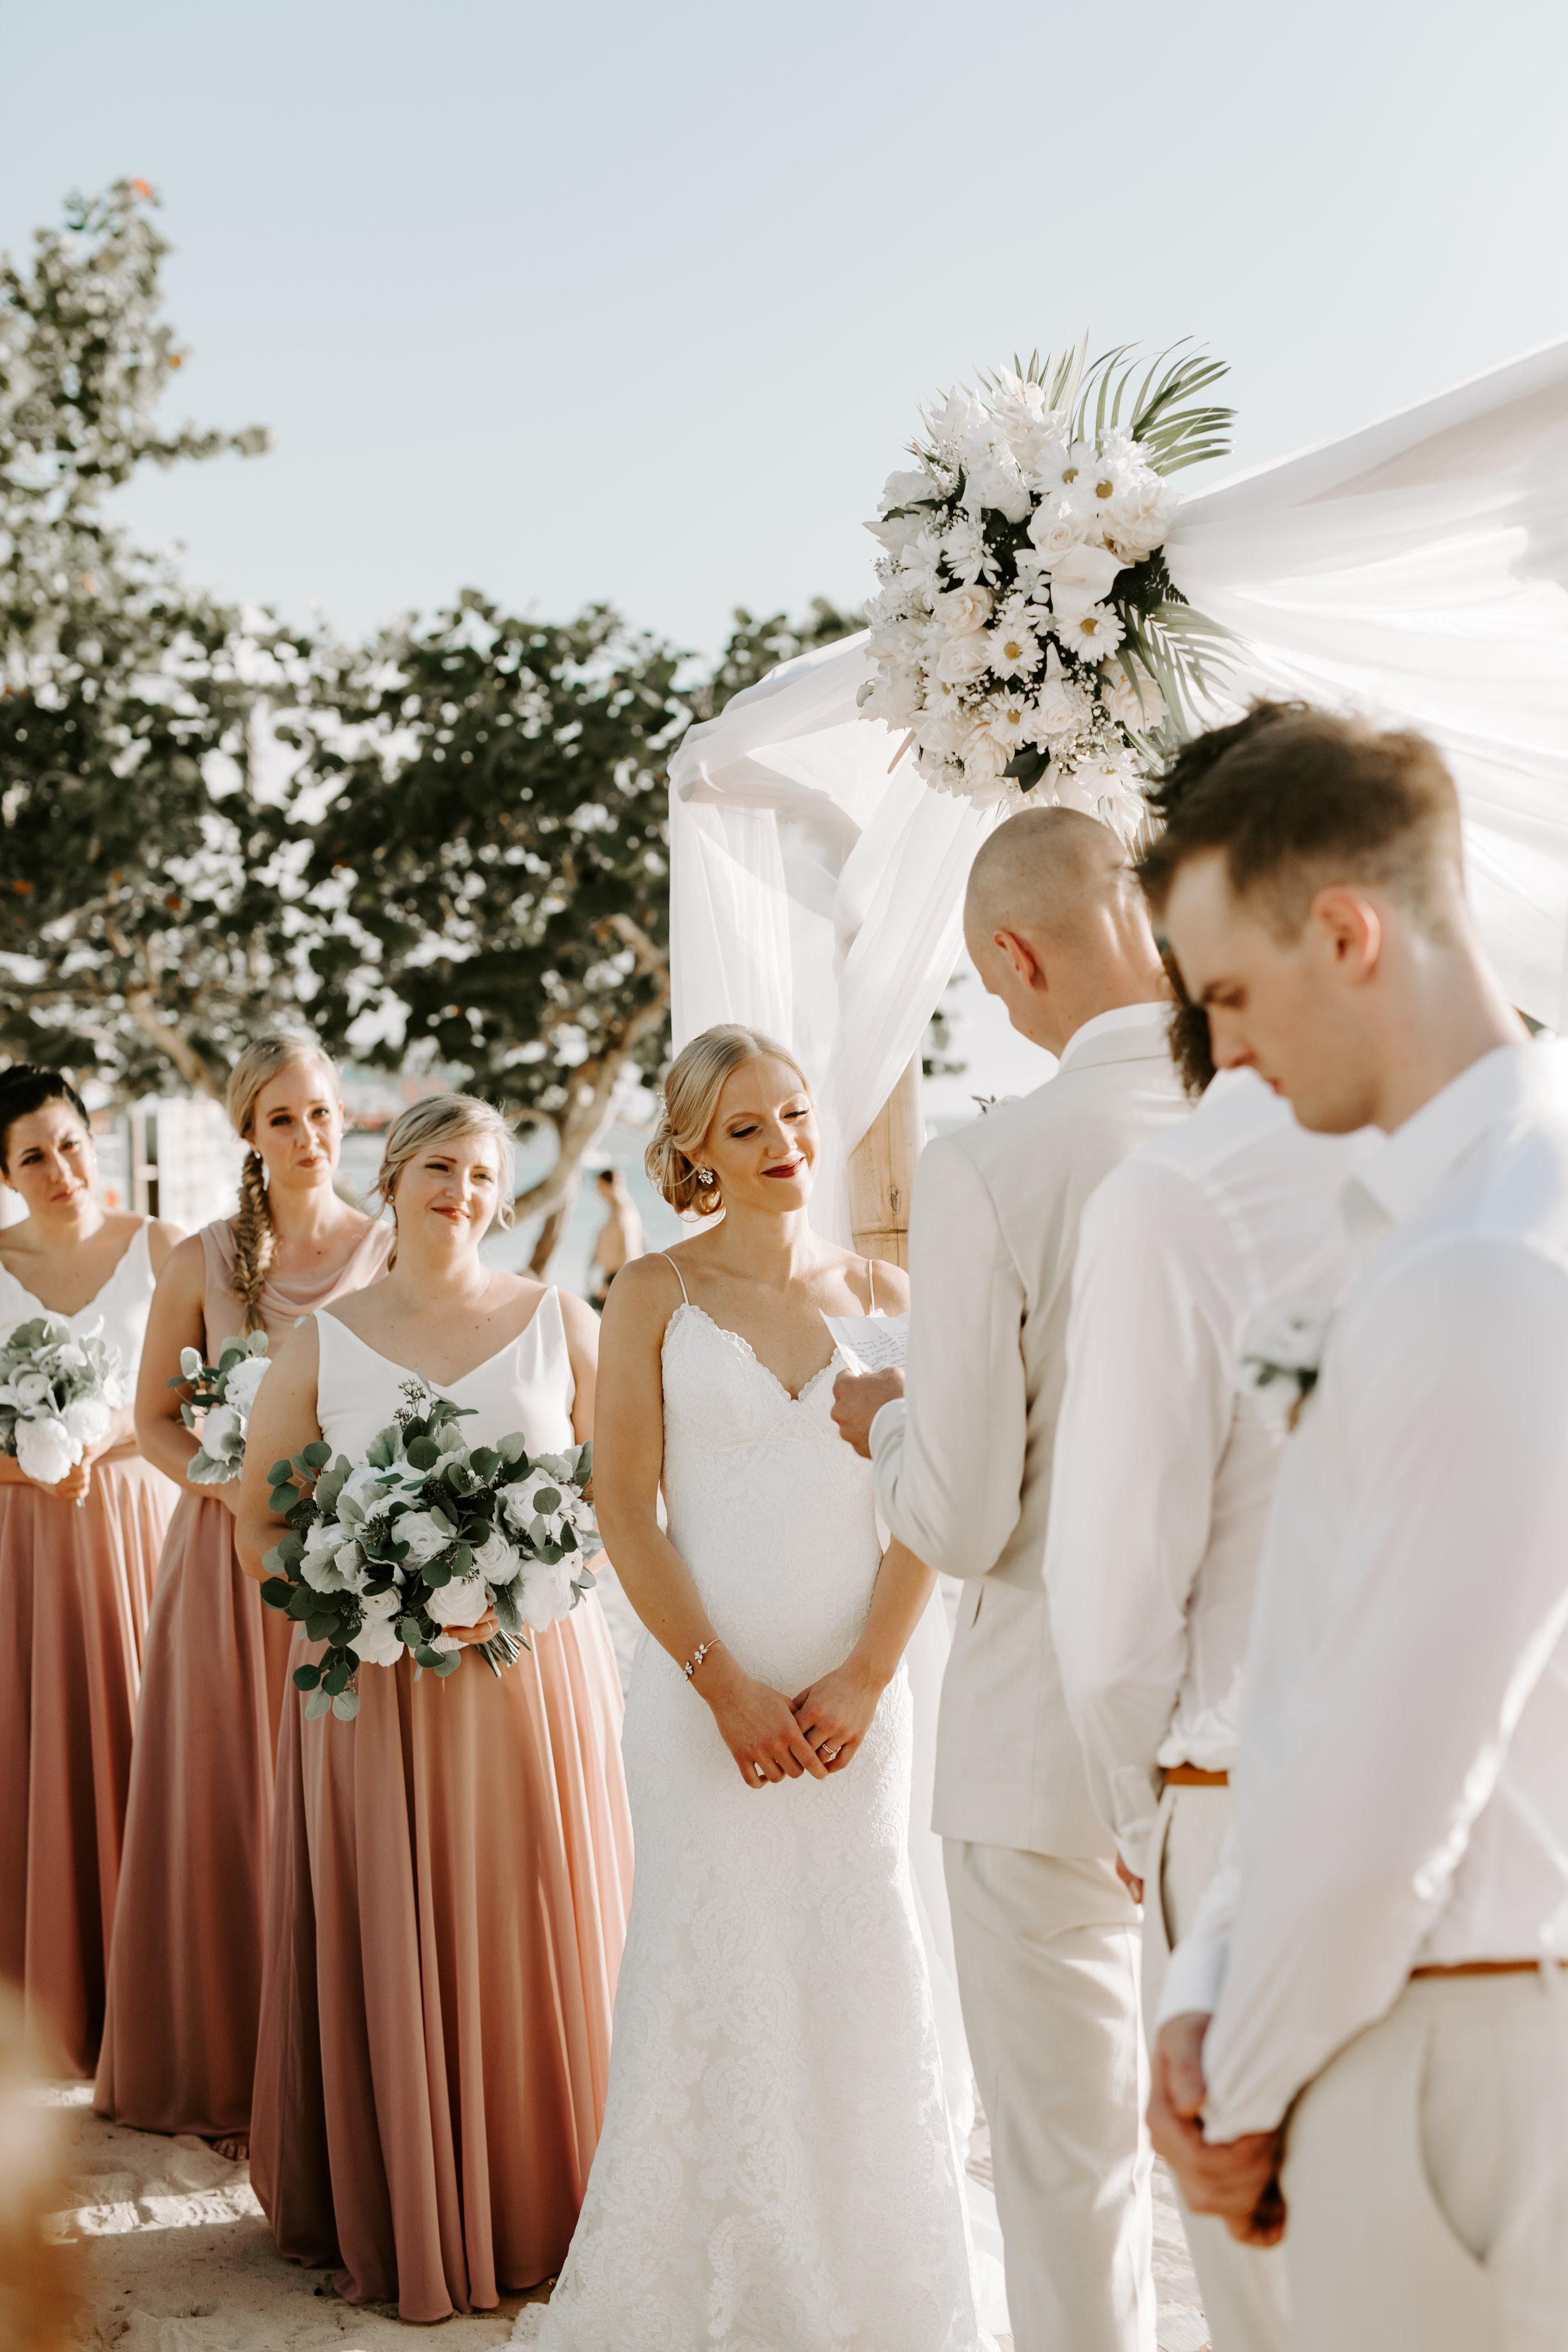 wedding vows, wedding ceremony, beach wedding ceremony, beach bride, wedding day, destination wedding, beach wedding, jamaican wedding, define fettle